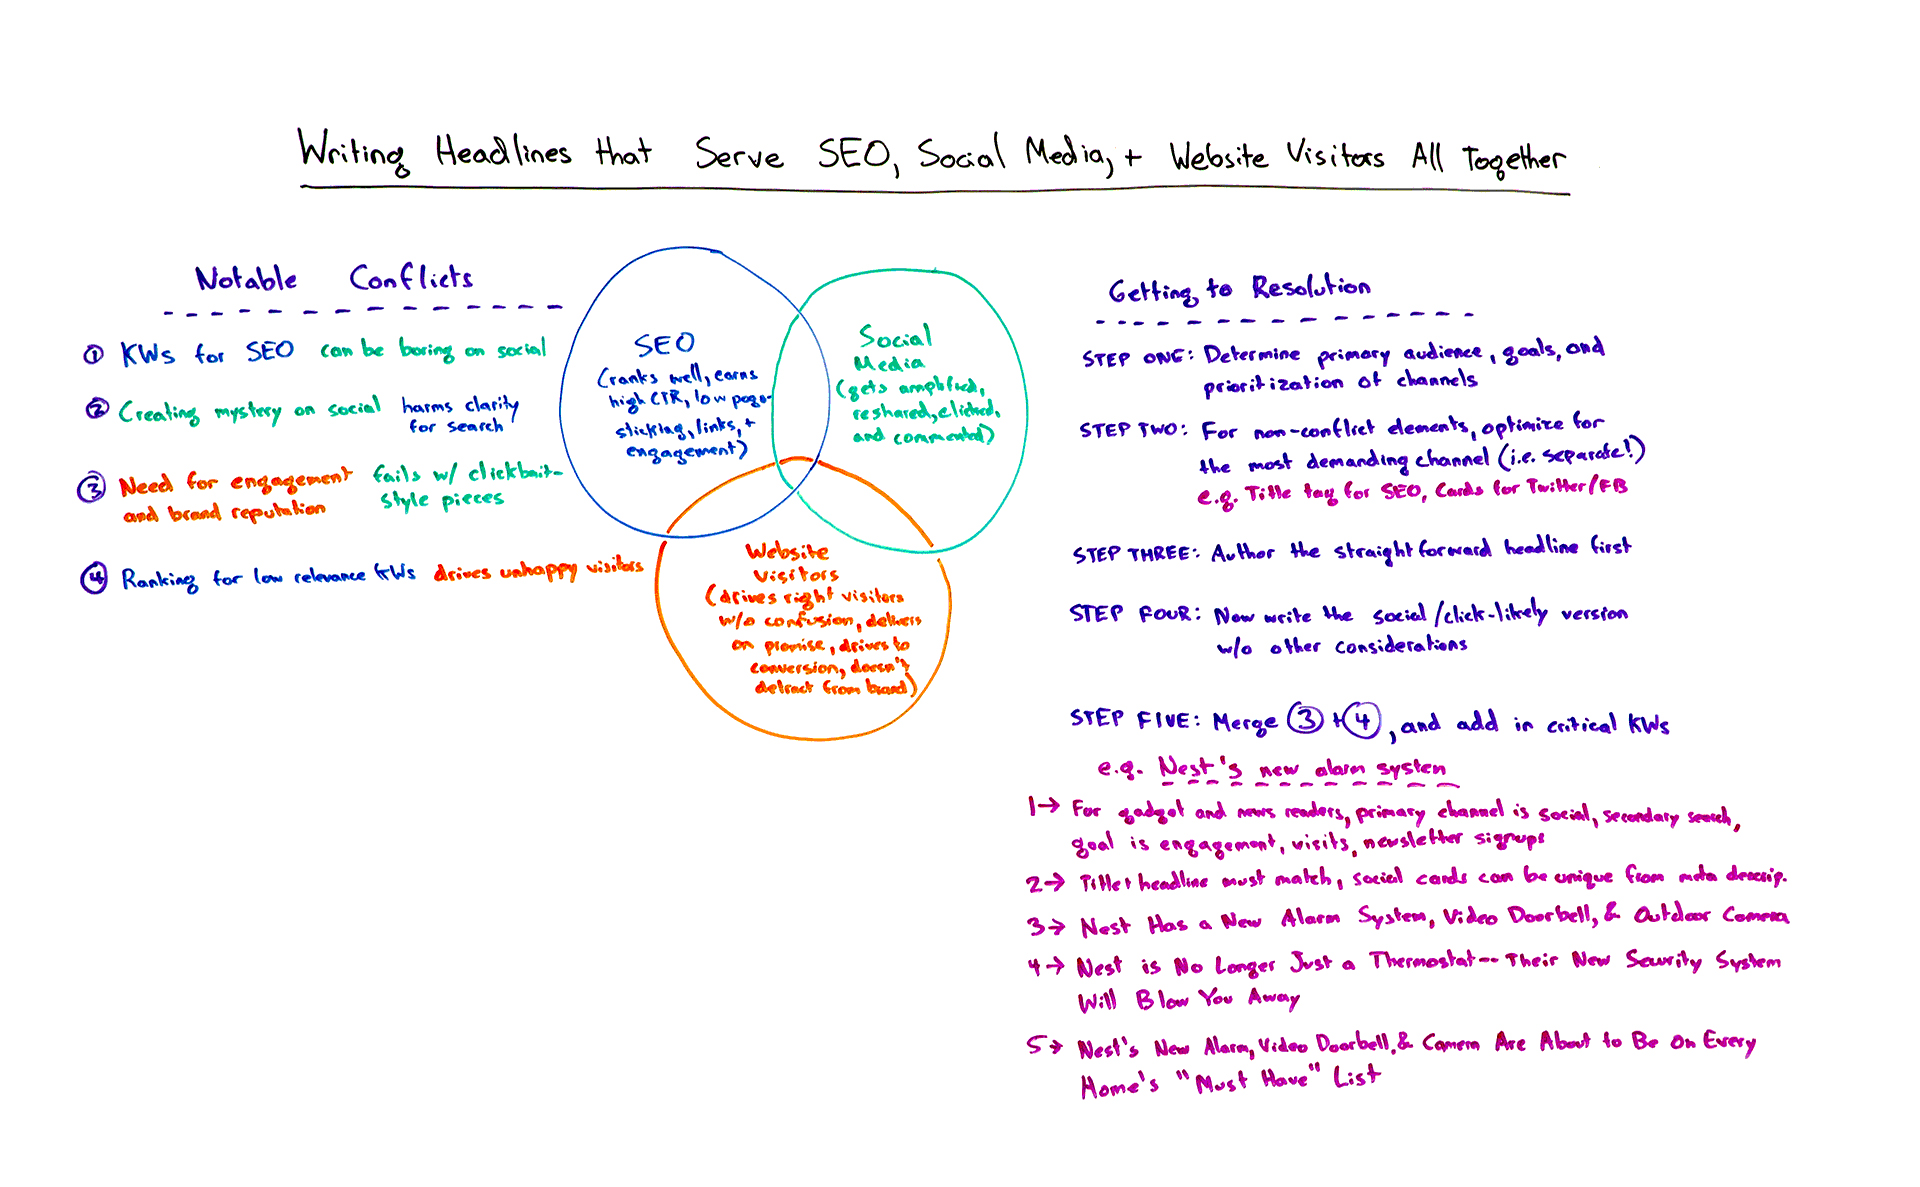 Writing headlines that serve SEO, Social Media, and Website Visitors